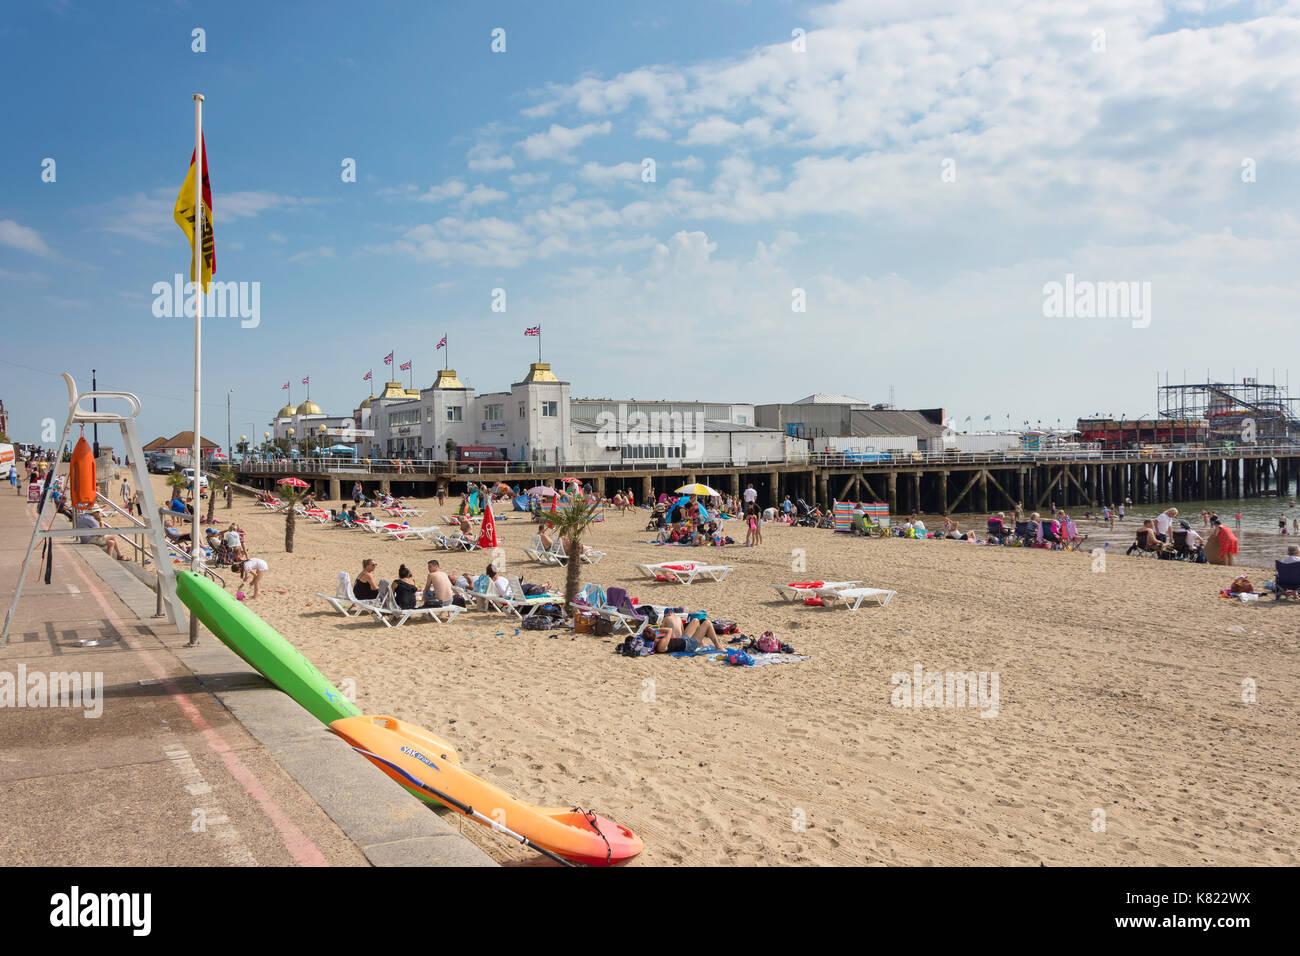 Clacton Pier and beach, Clacton-on-Sea, Essex, England, United Kingdom - Stock Image